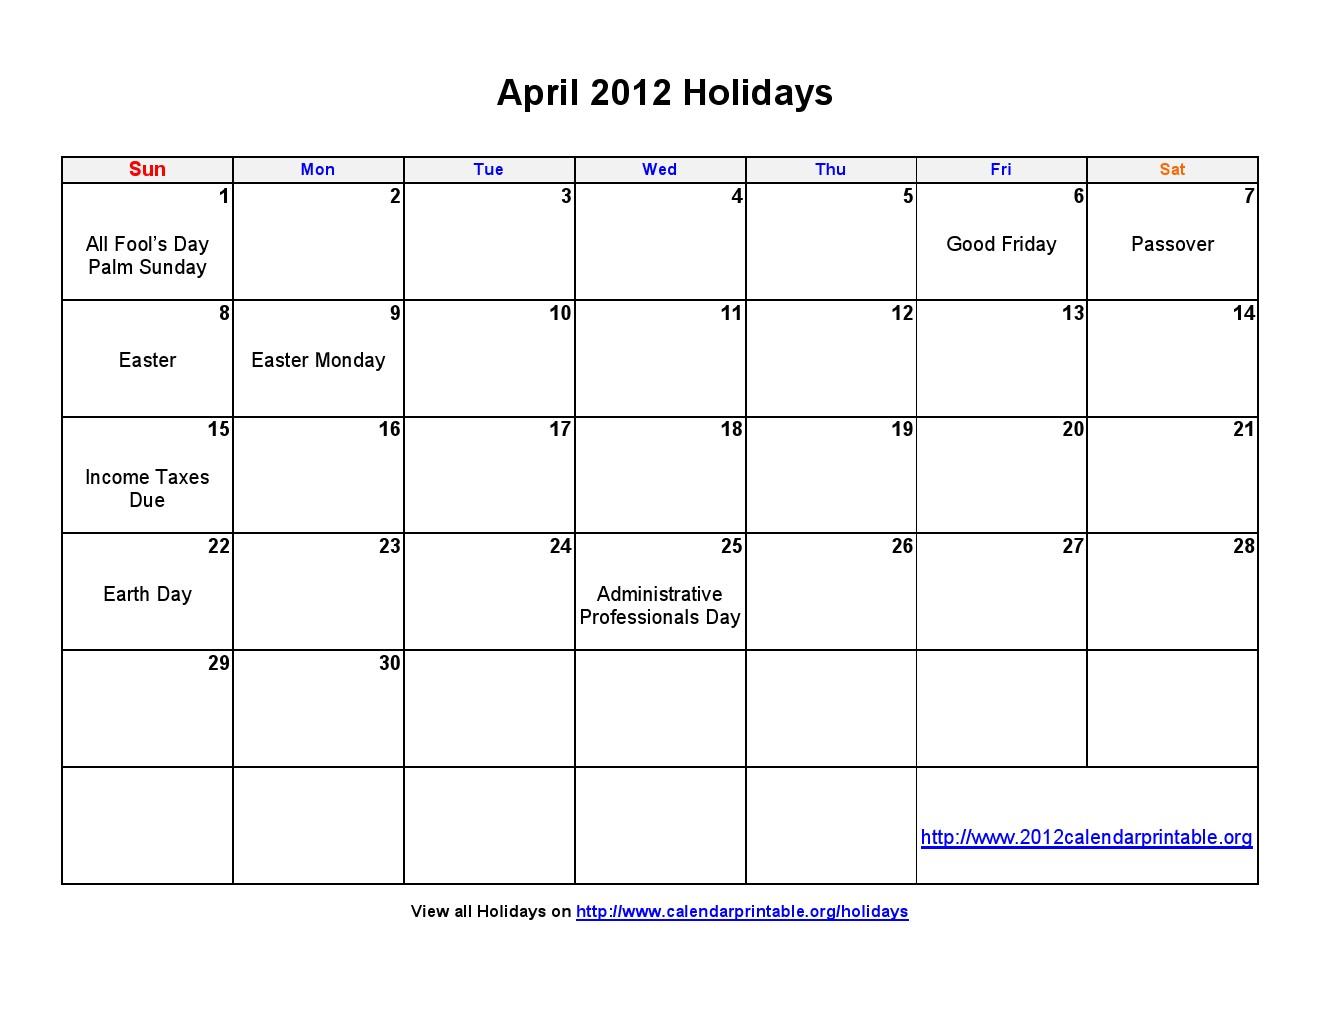 april+calendar+2012+printable_calendar_April_2012_Holidays.jpg